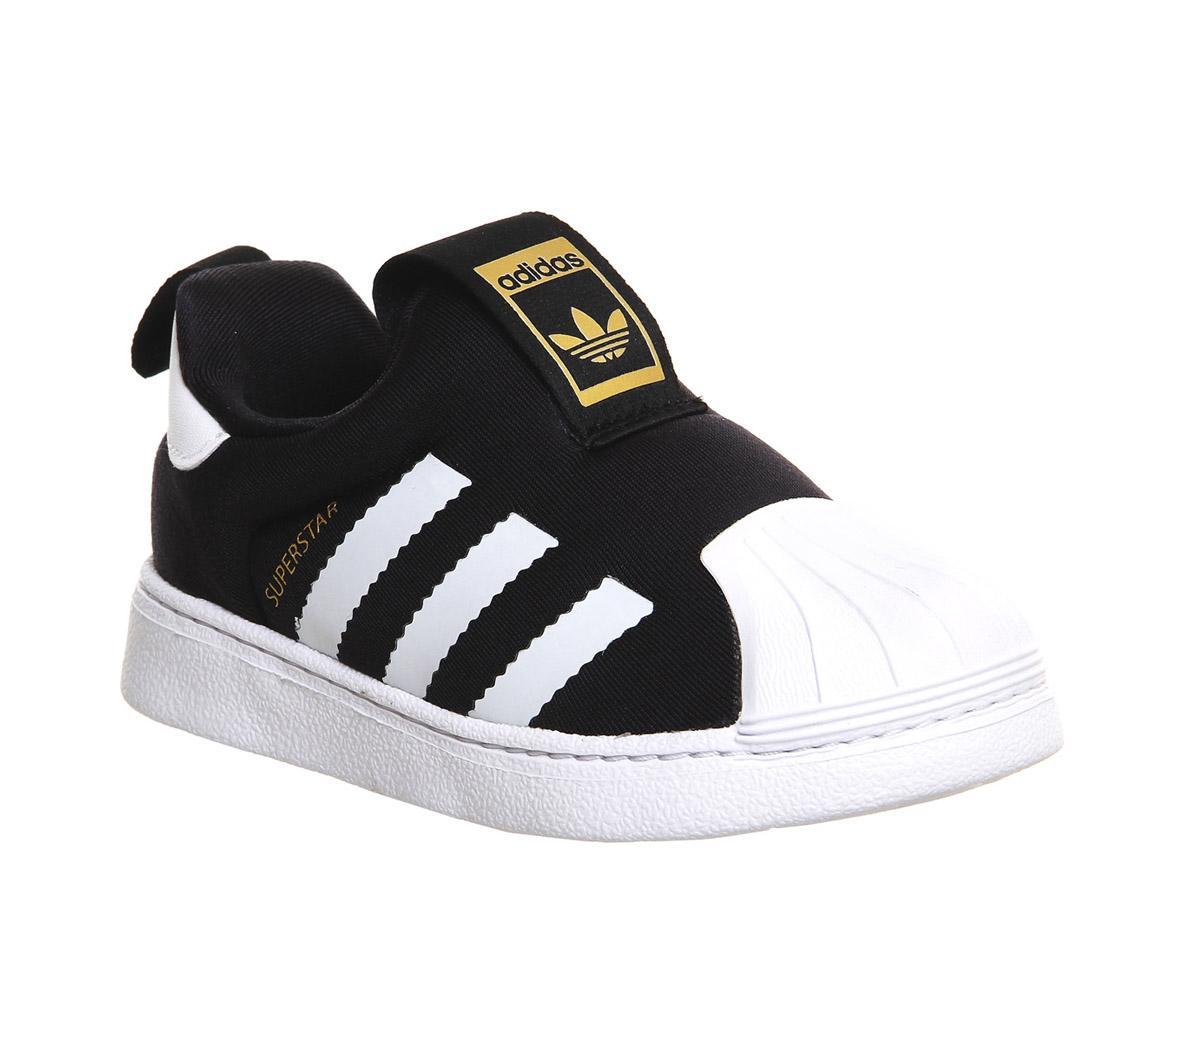 adidas Superstar 360 Inf 3-9 Core Black